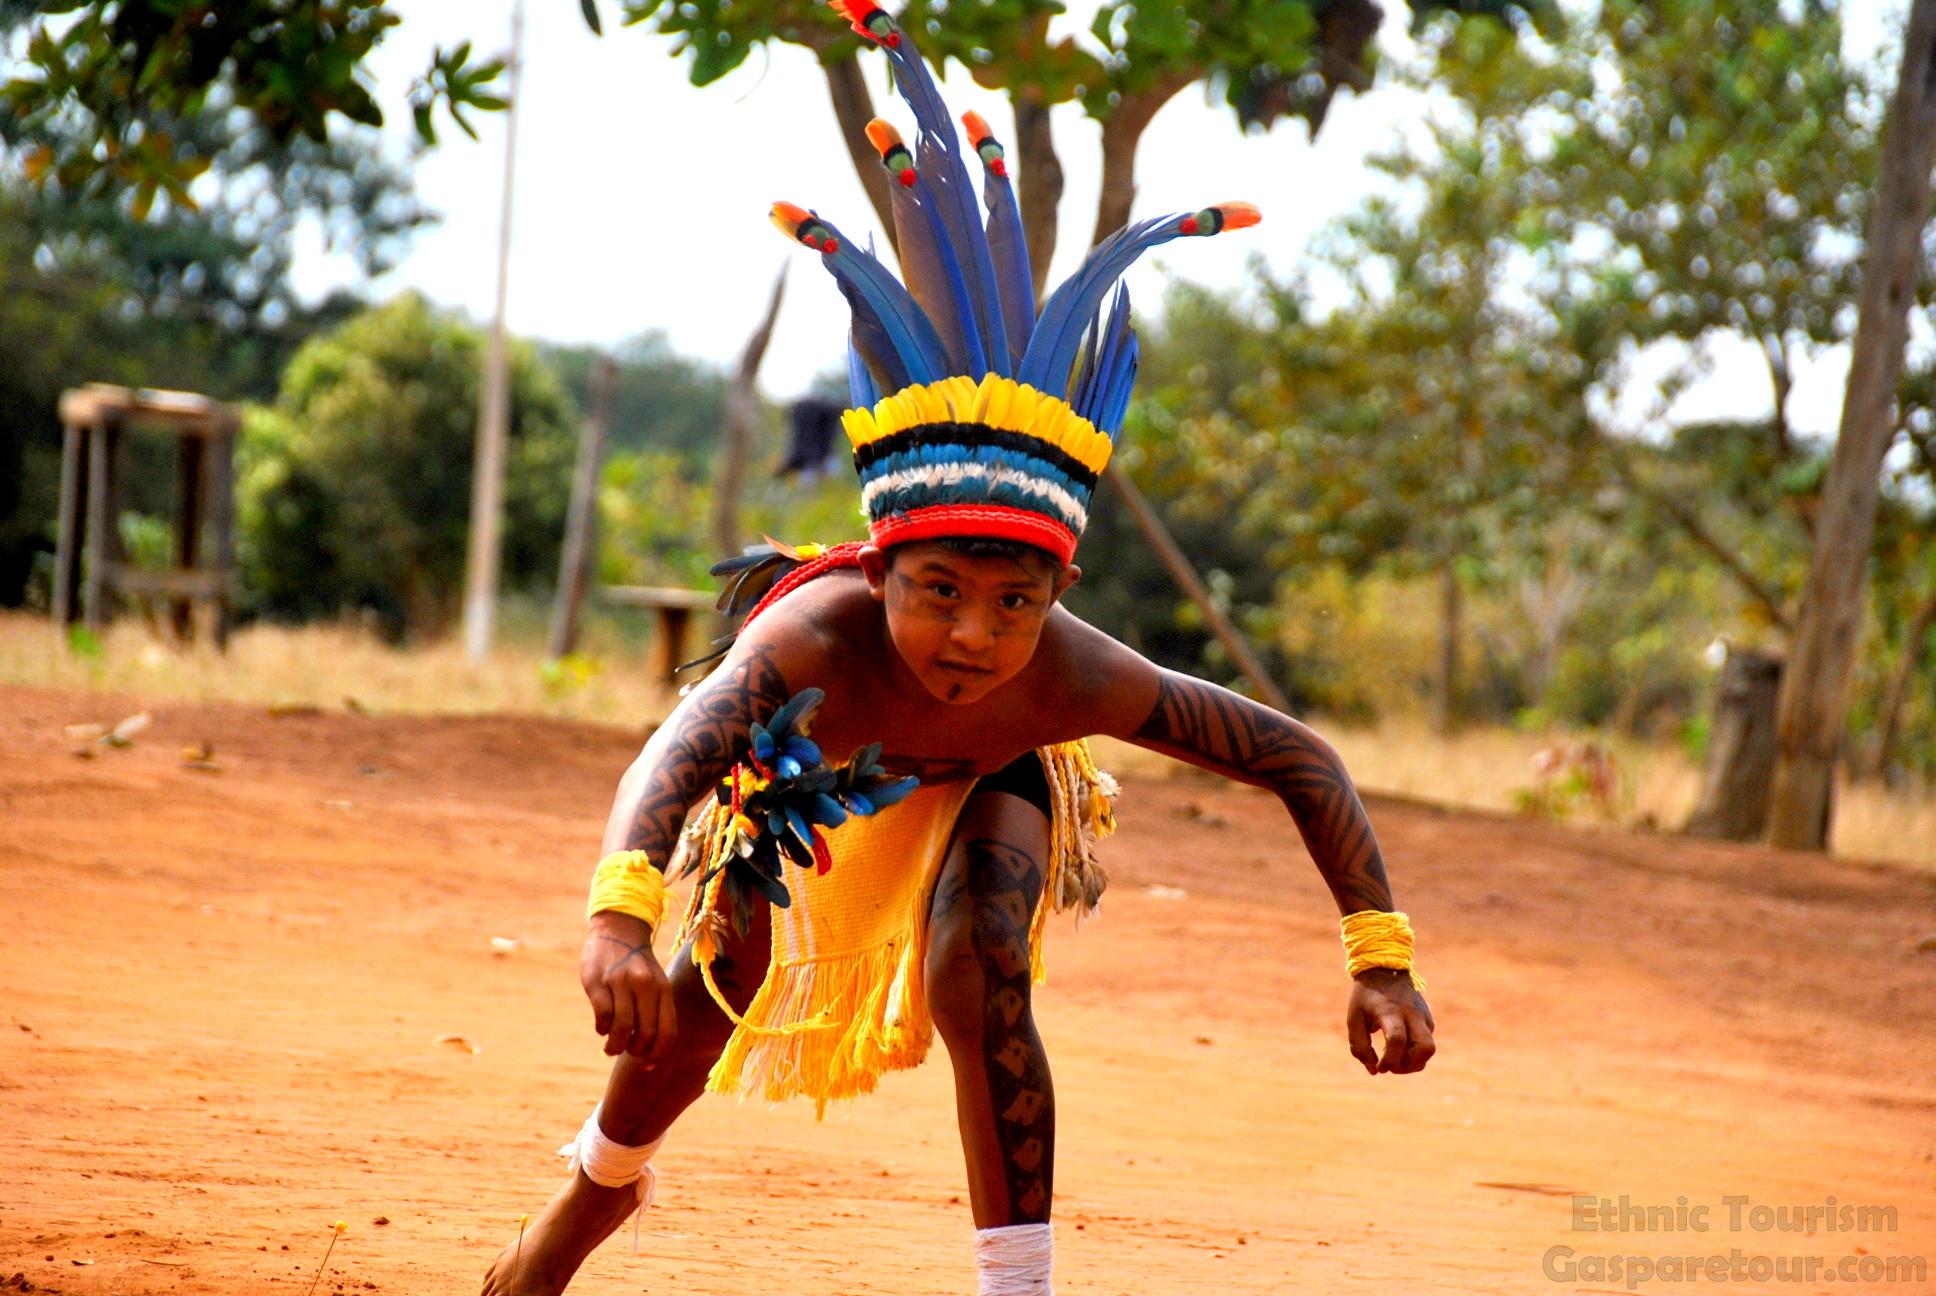 Amazon ethnic tours